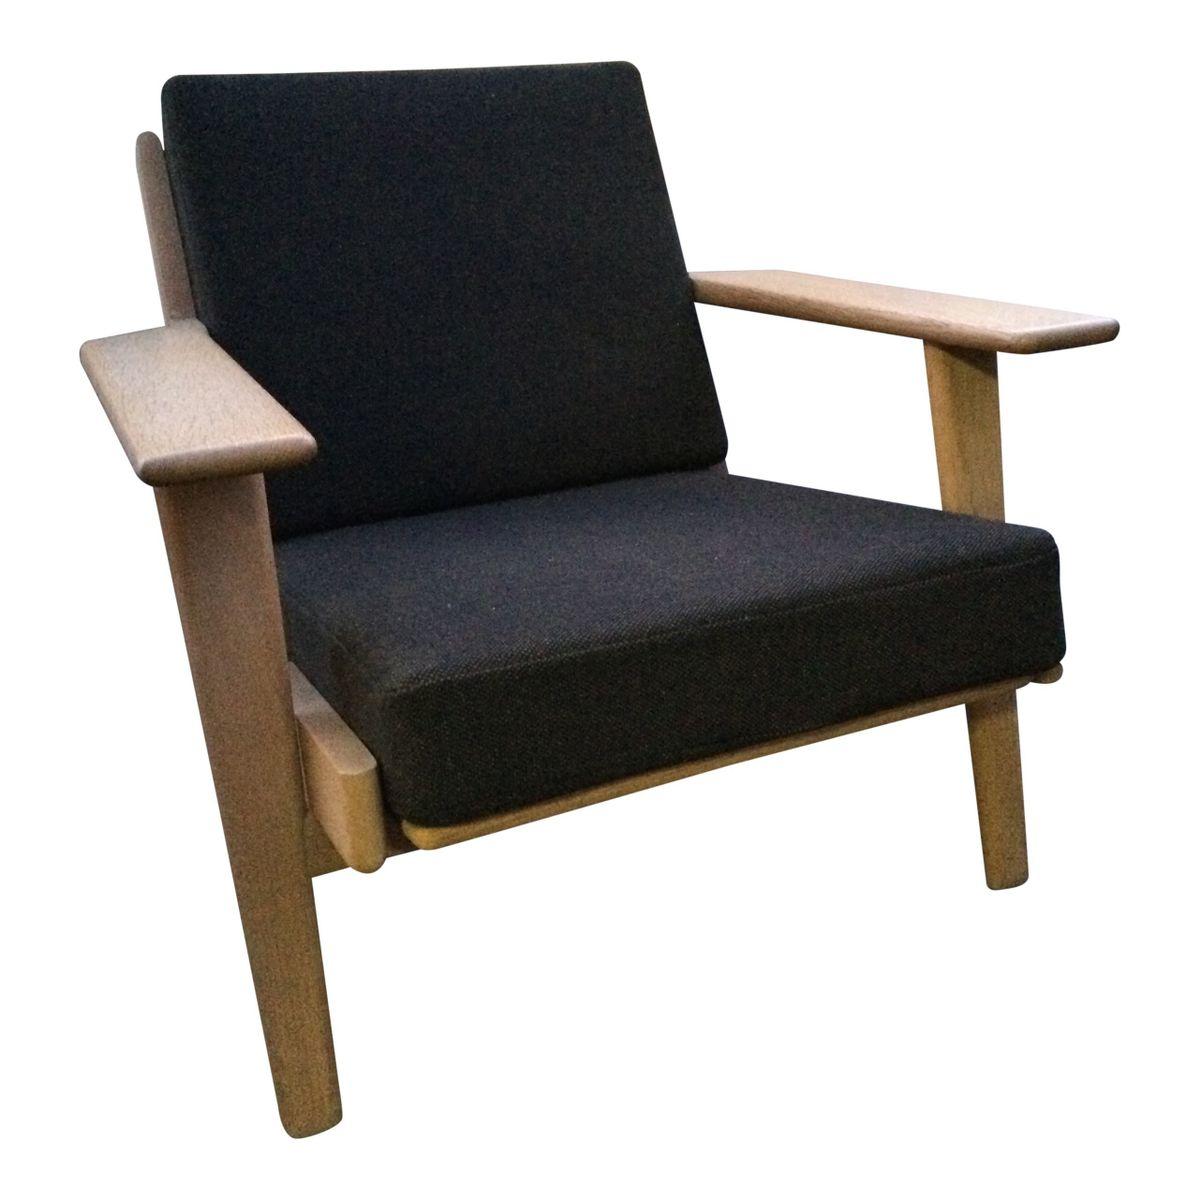 schwarzer ge290 sessel von hans j wegner f r getama bei. Black Bedroom Furniture Sets. Home Design Ideas